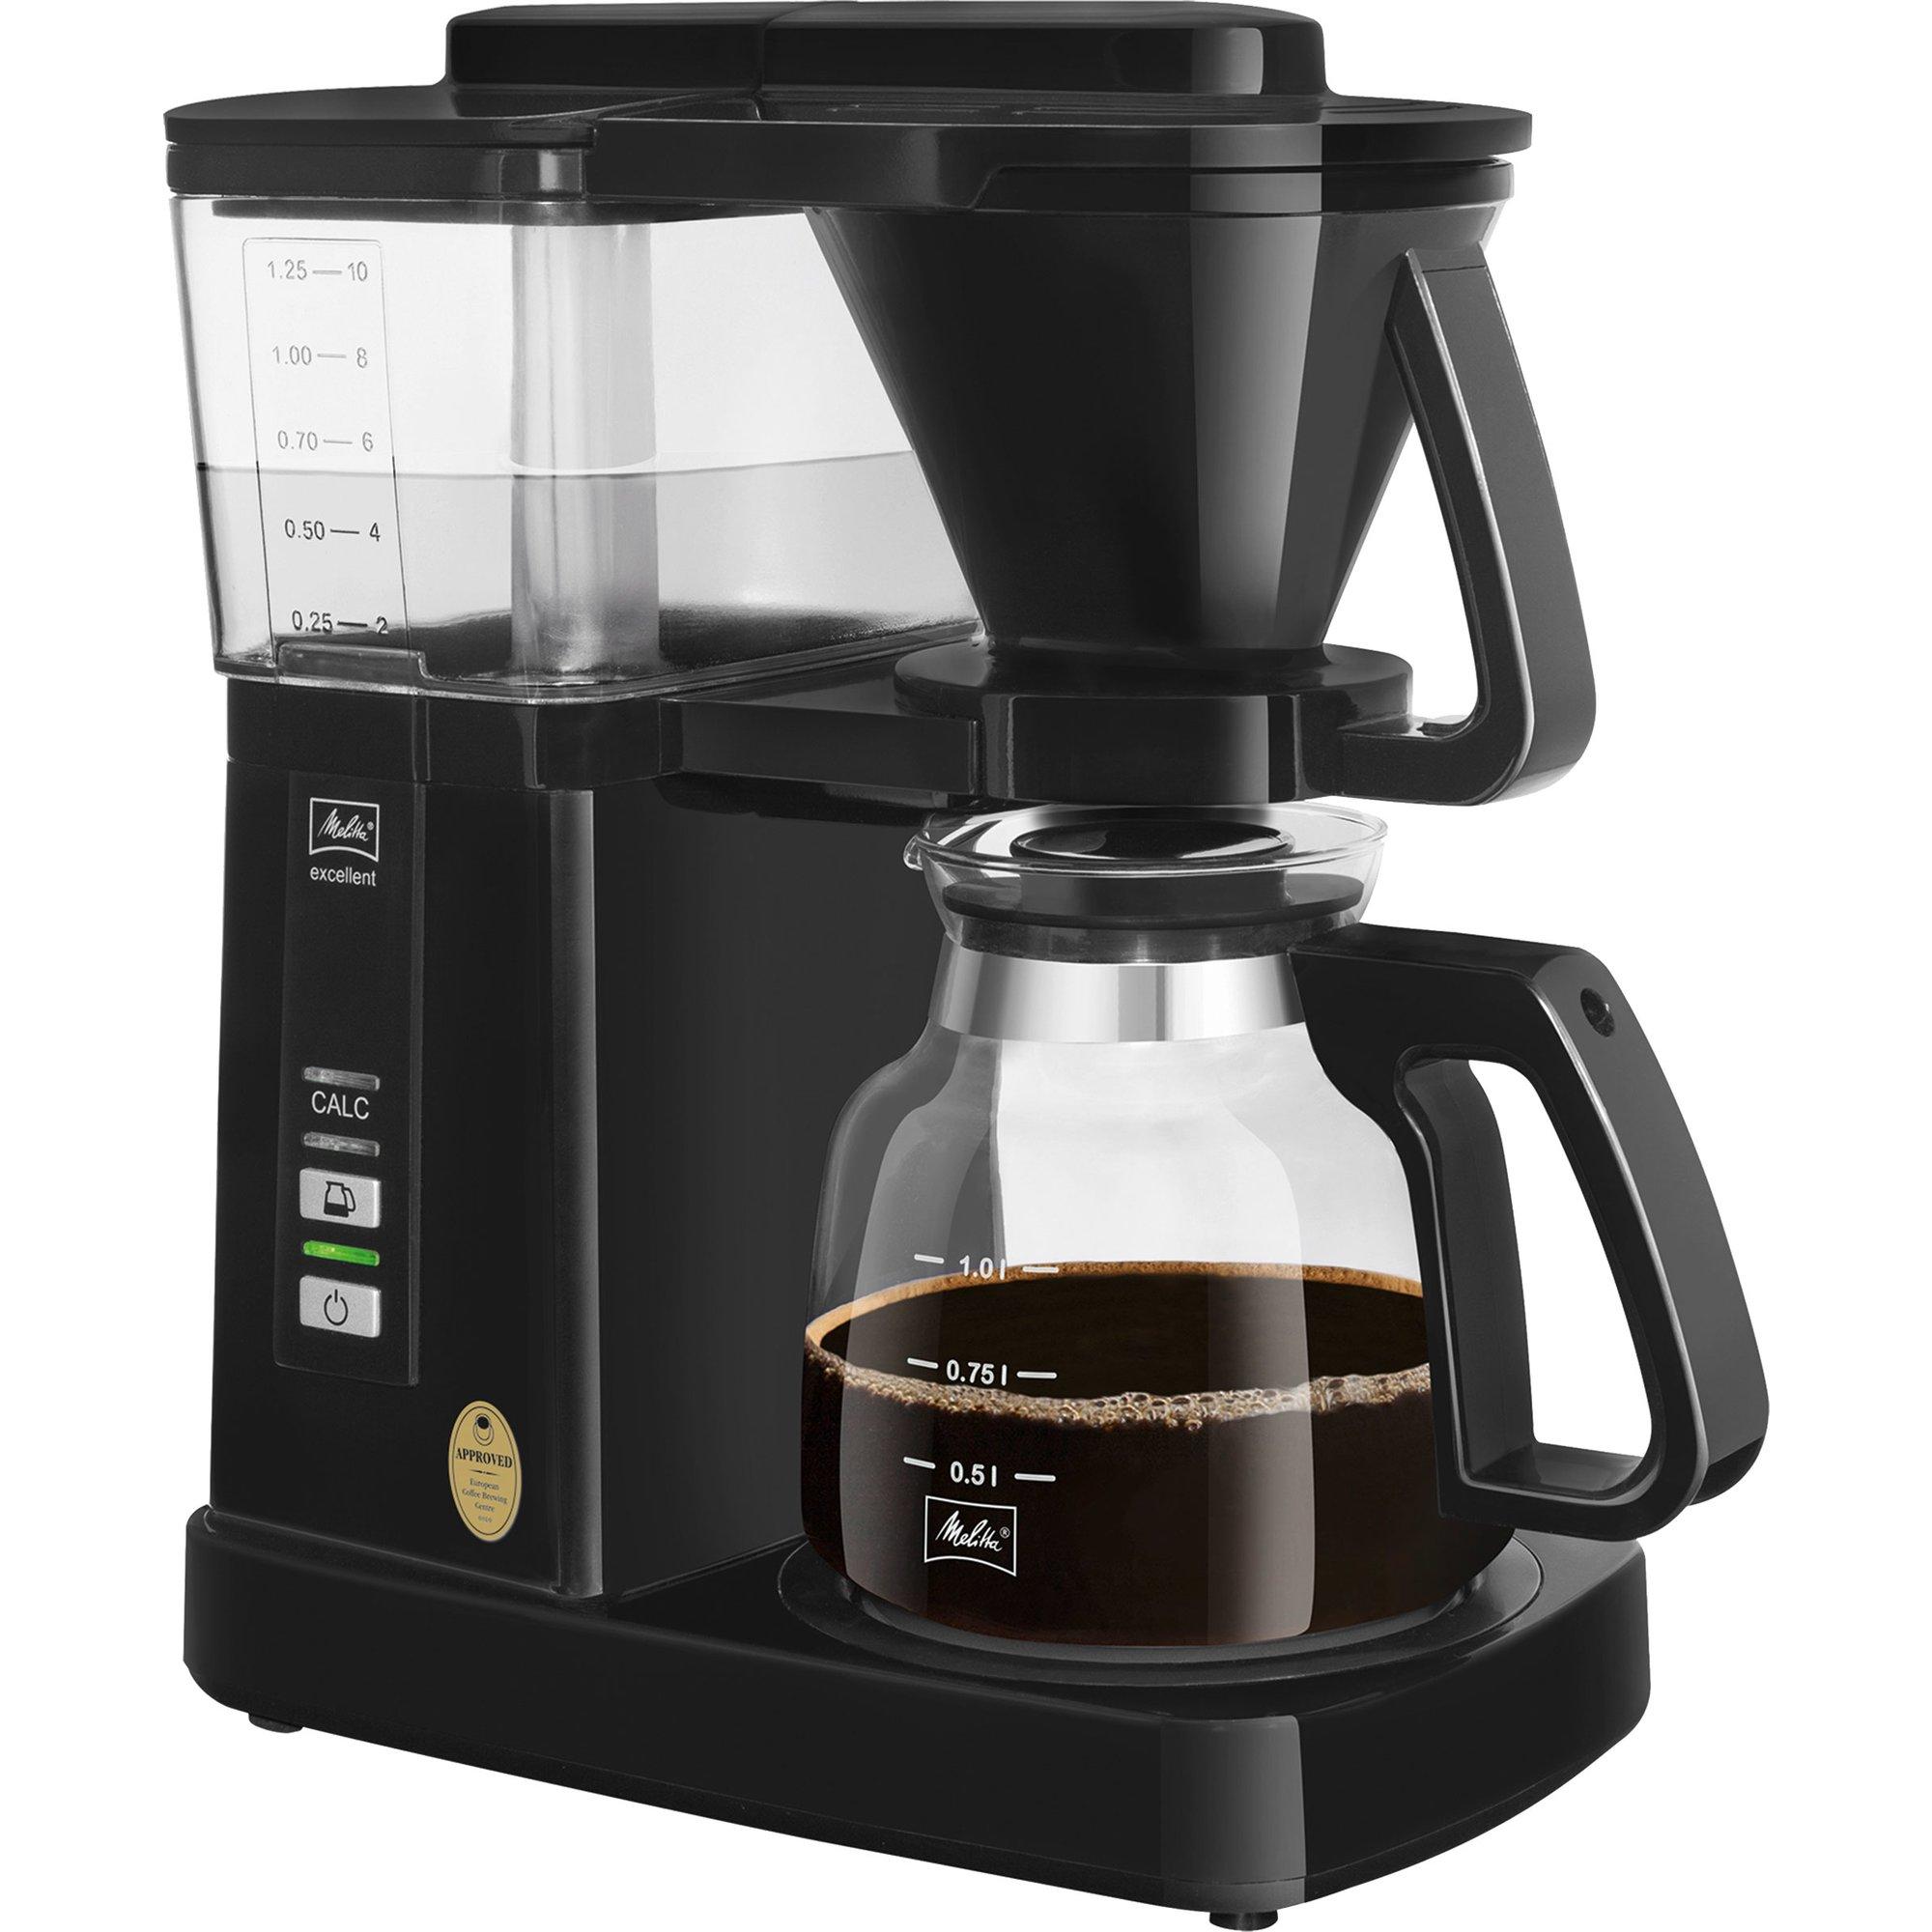 Melitta Excellent 5.0 kaffebryggare